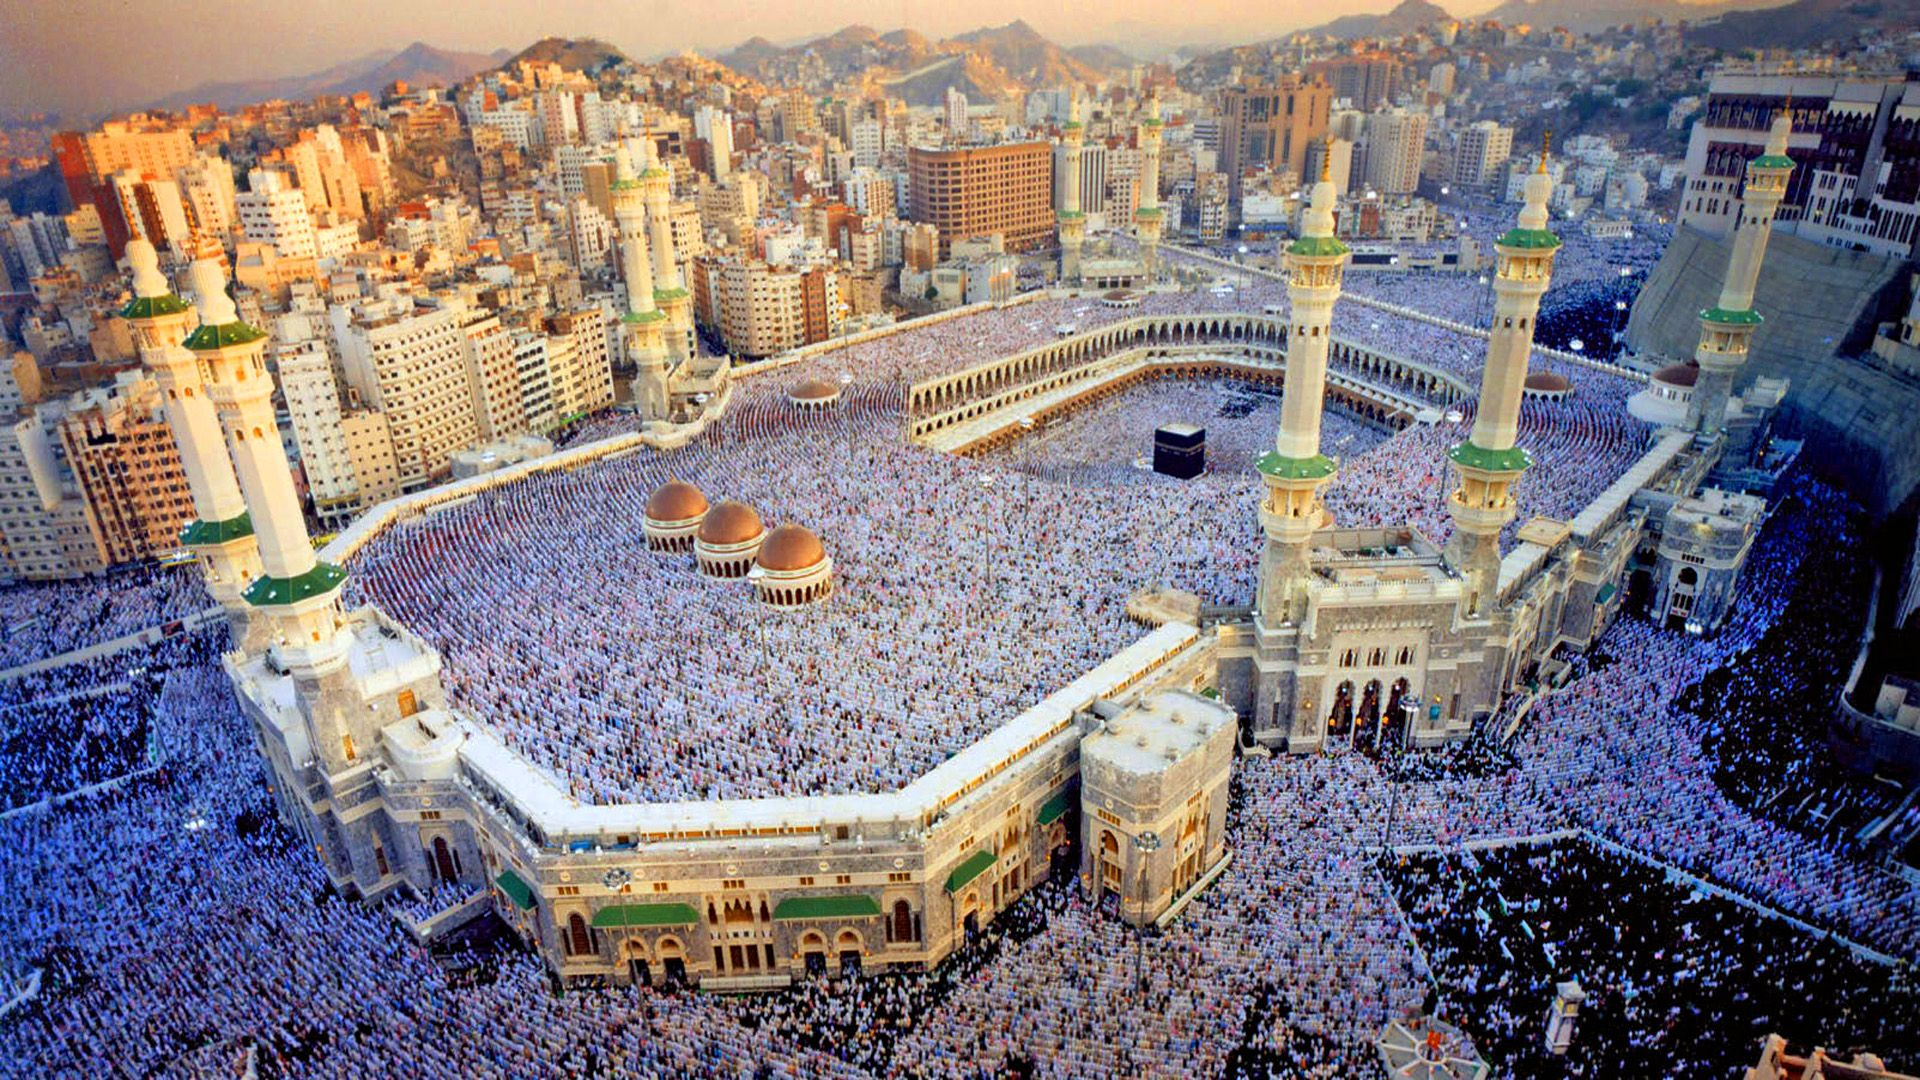 Download Al Kaaba Al Musharrafah Holy Kaaba Is A Building